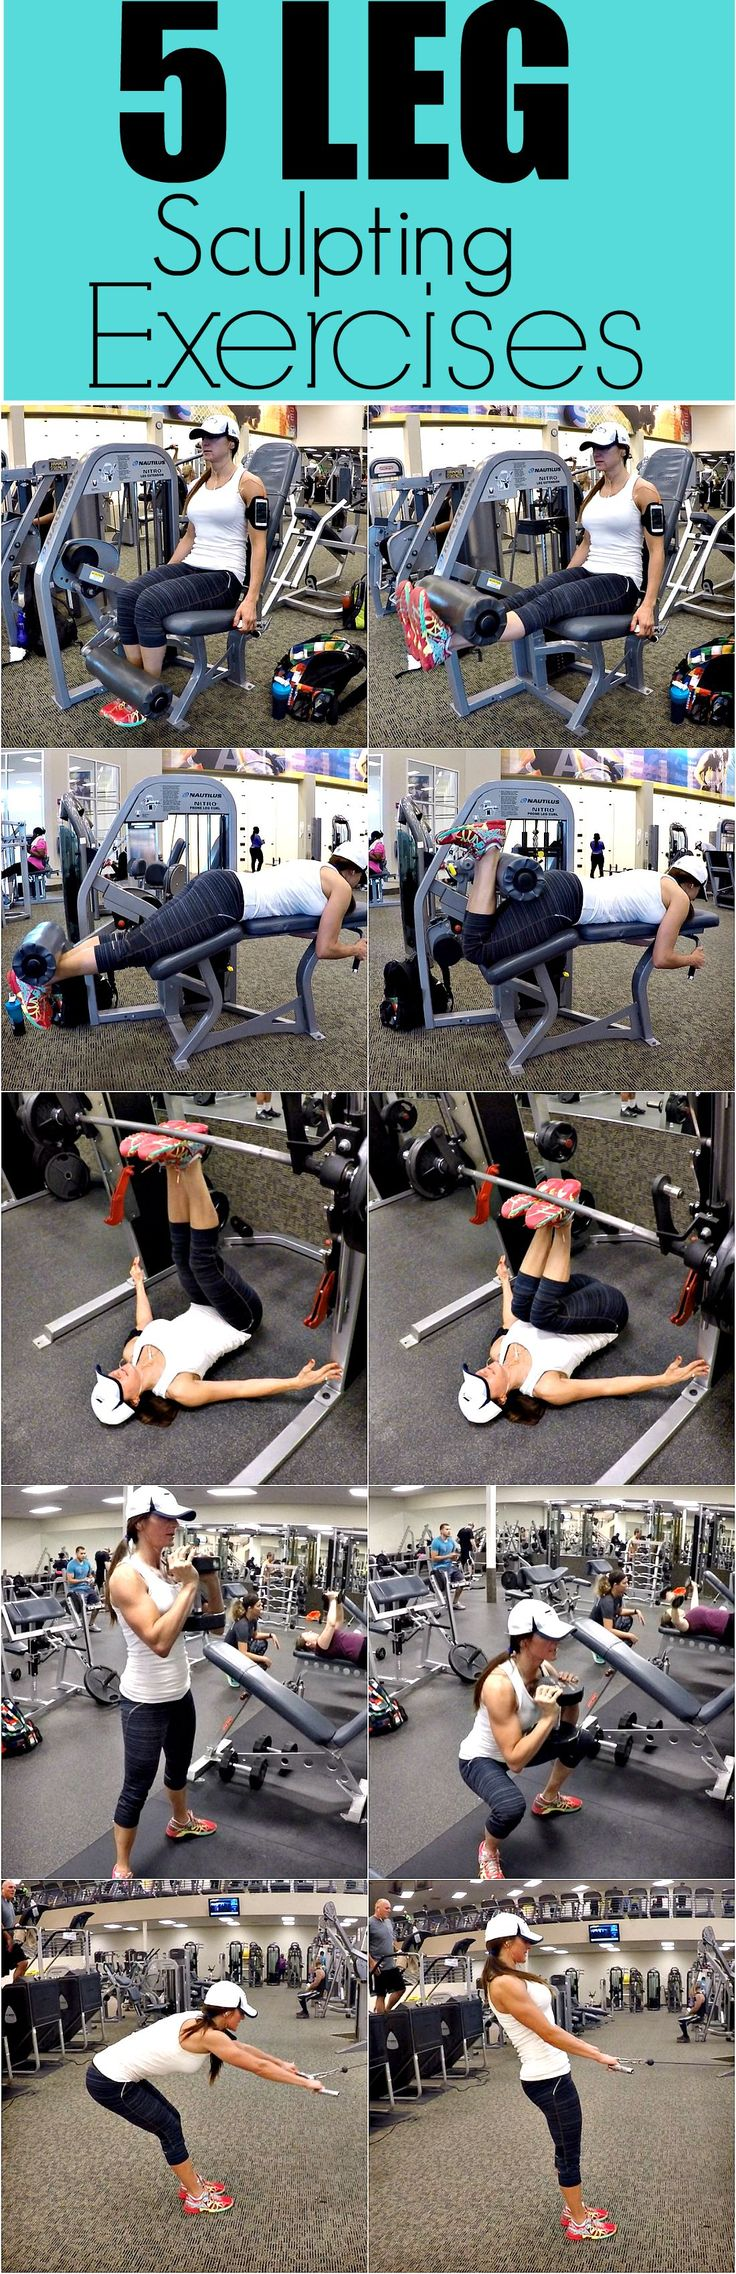 5 LEG SCULPTING EXERCISES